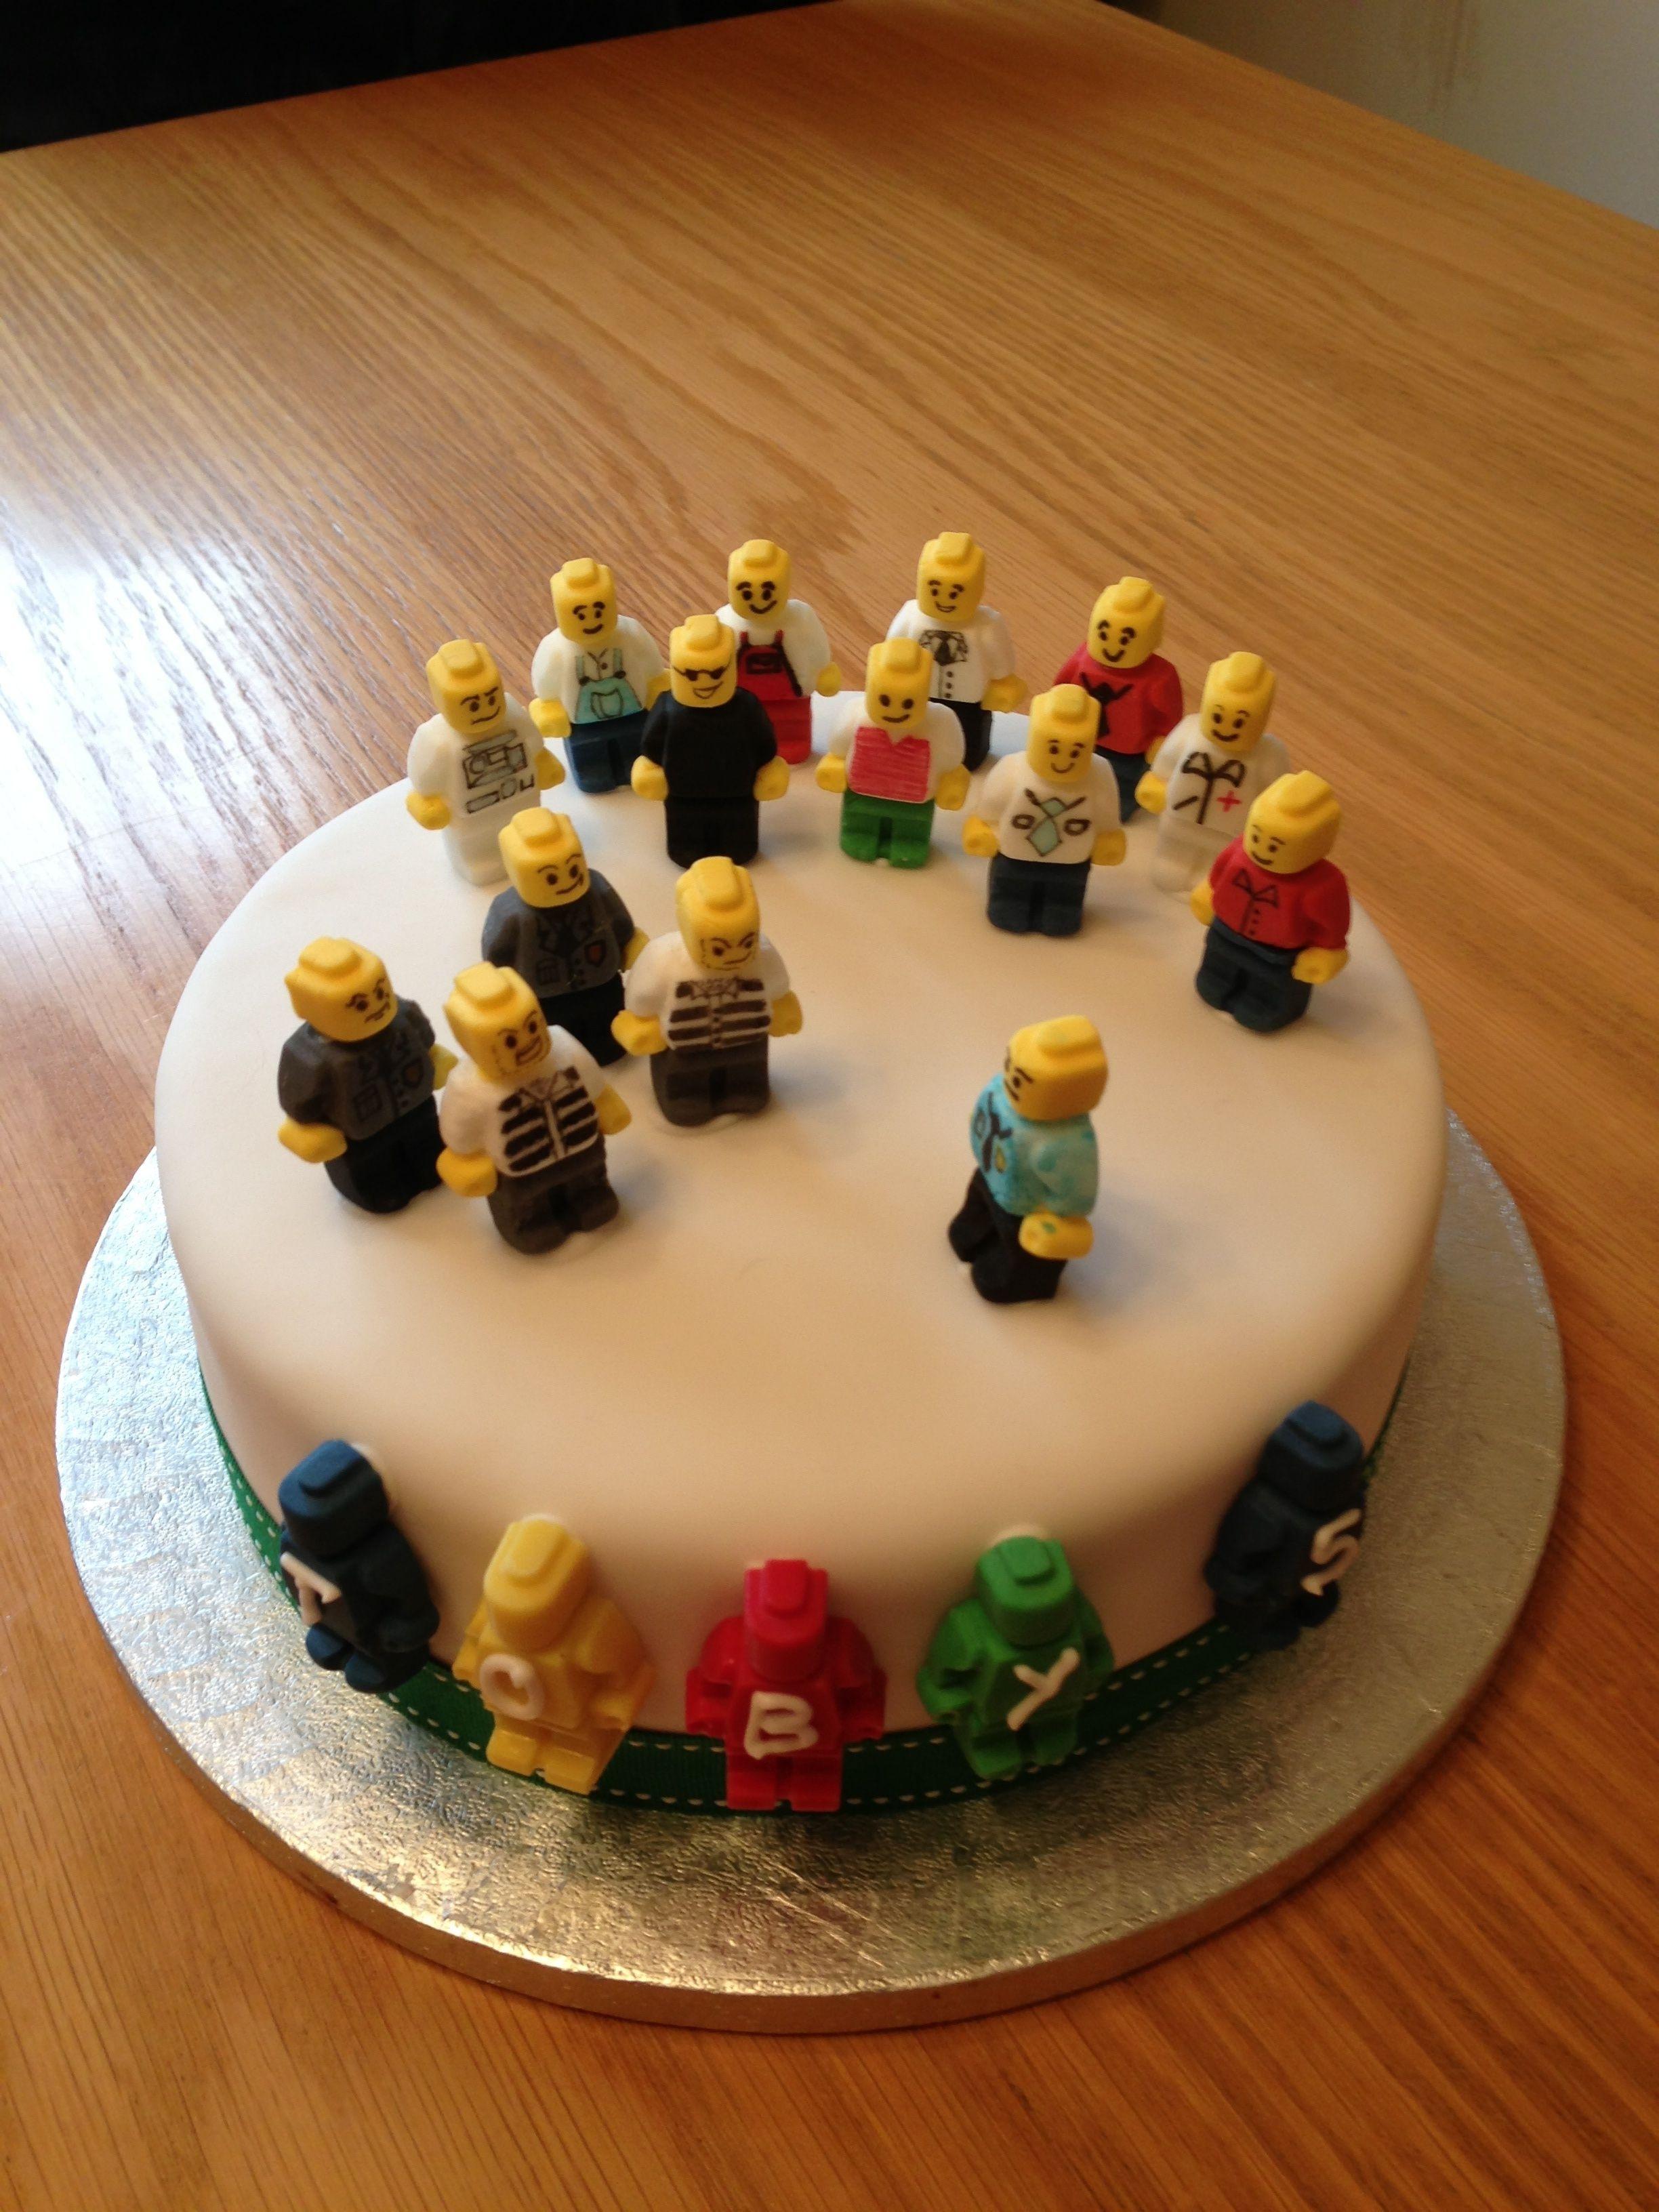 Lego City Police Birthday Cake With Handmade Minifigures